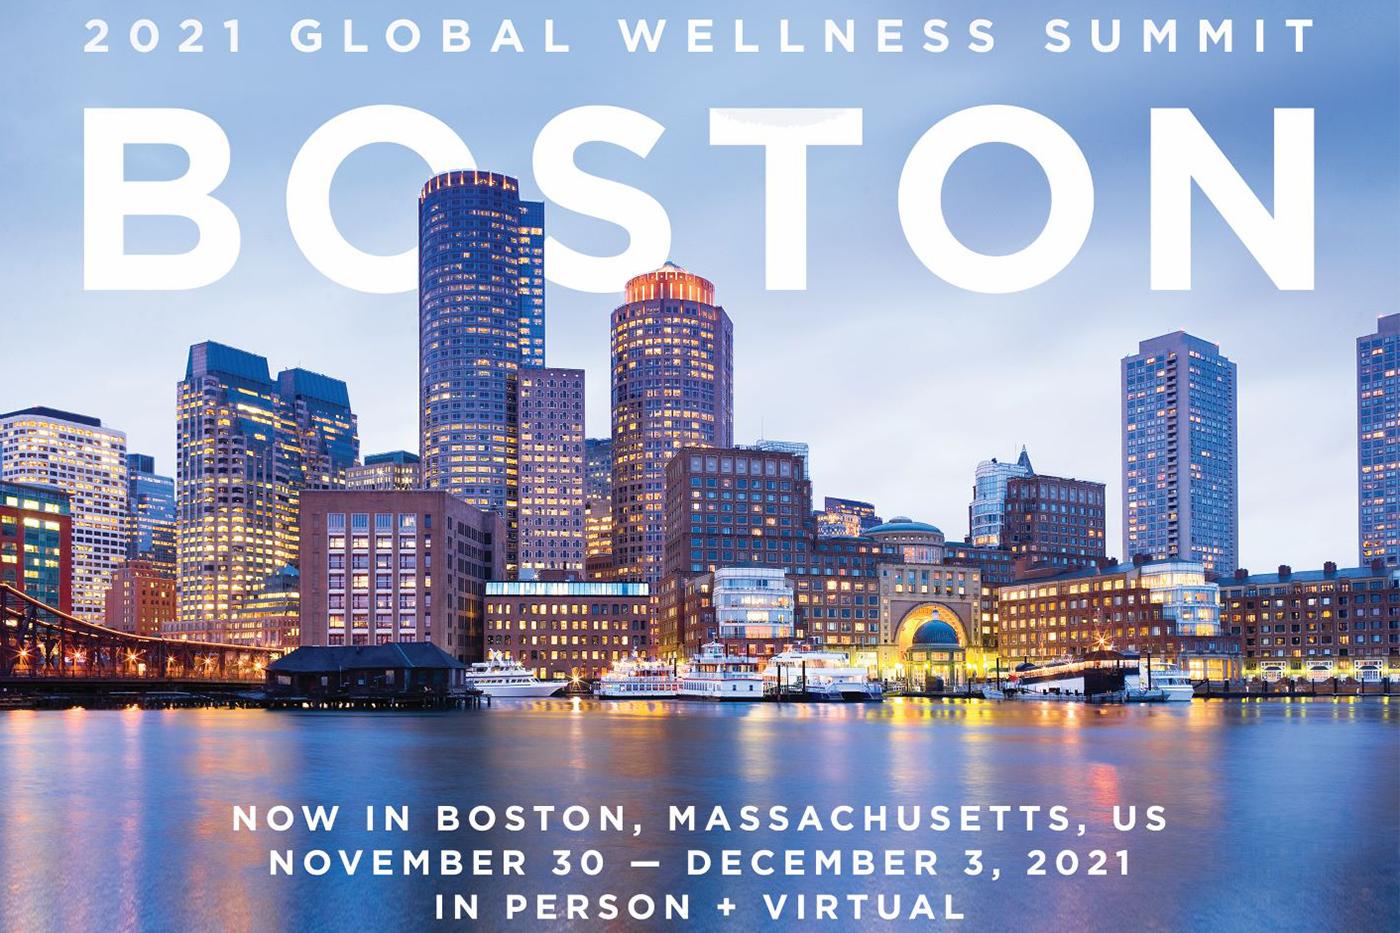 Global Wellness Summit 2021 location changed from Tel Aviv to Boston